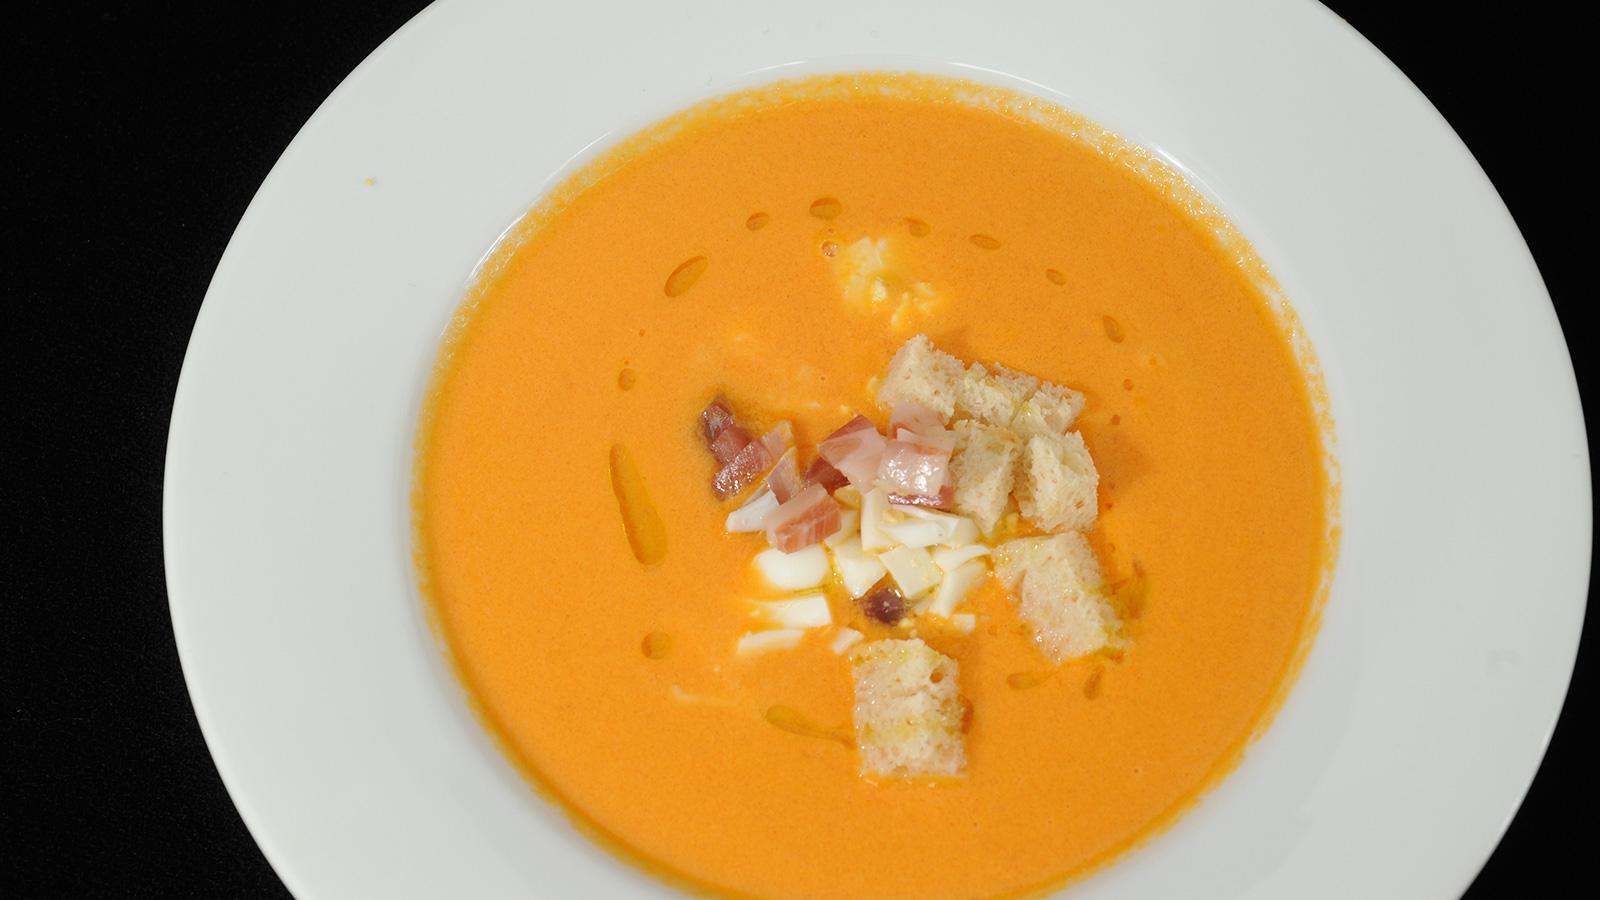 Salmorejo de zanahoria diana cabrera receta canal cocina for Diana cabrera canal cocina